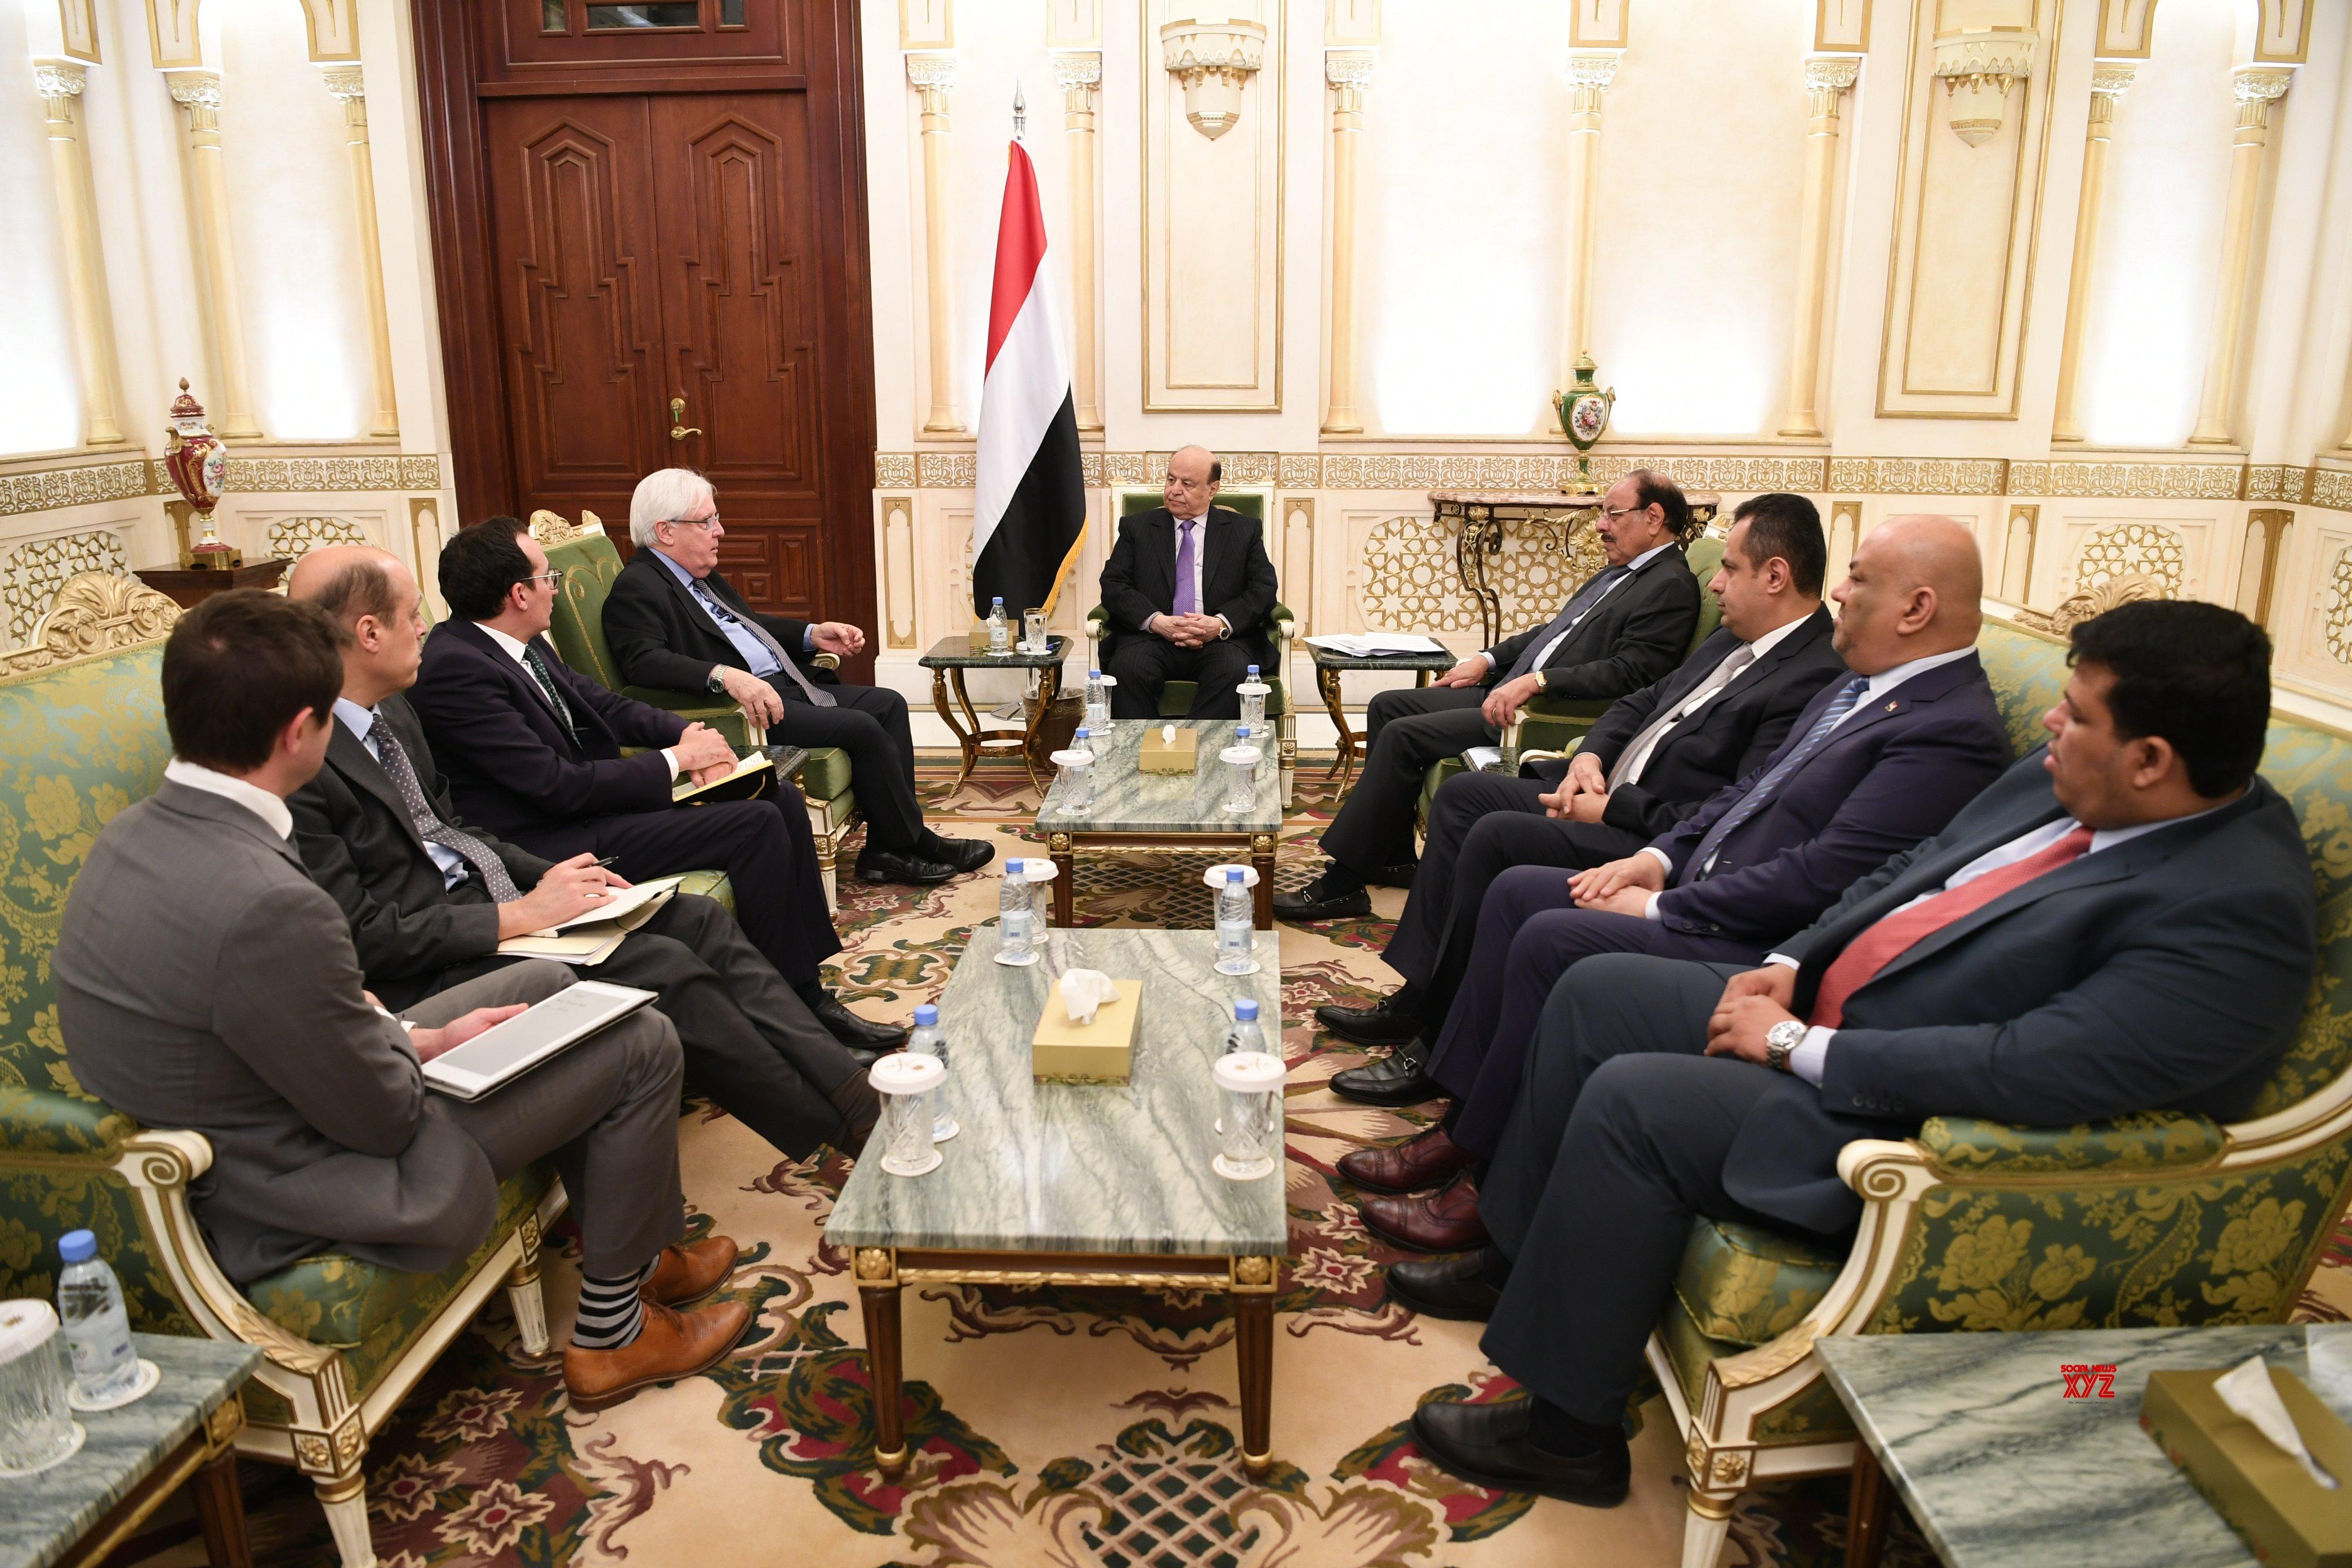 SAUDI ARABIA - RIYADH - YEMENI PRESIDENT - UN ENVOY - MEETING #Gallery